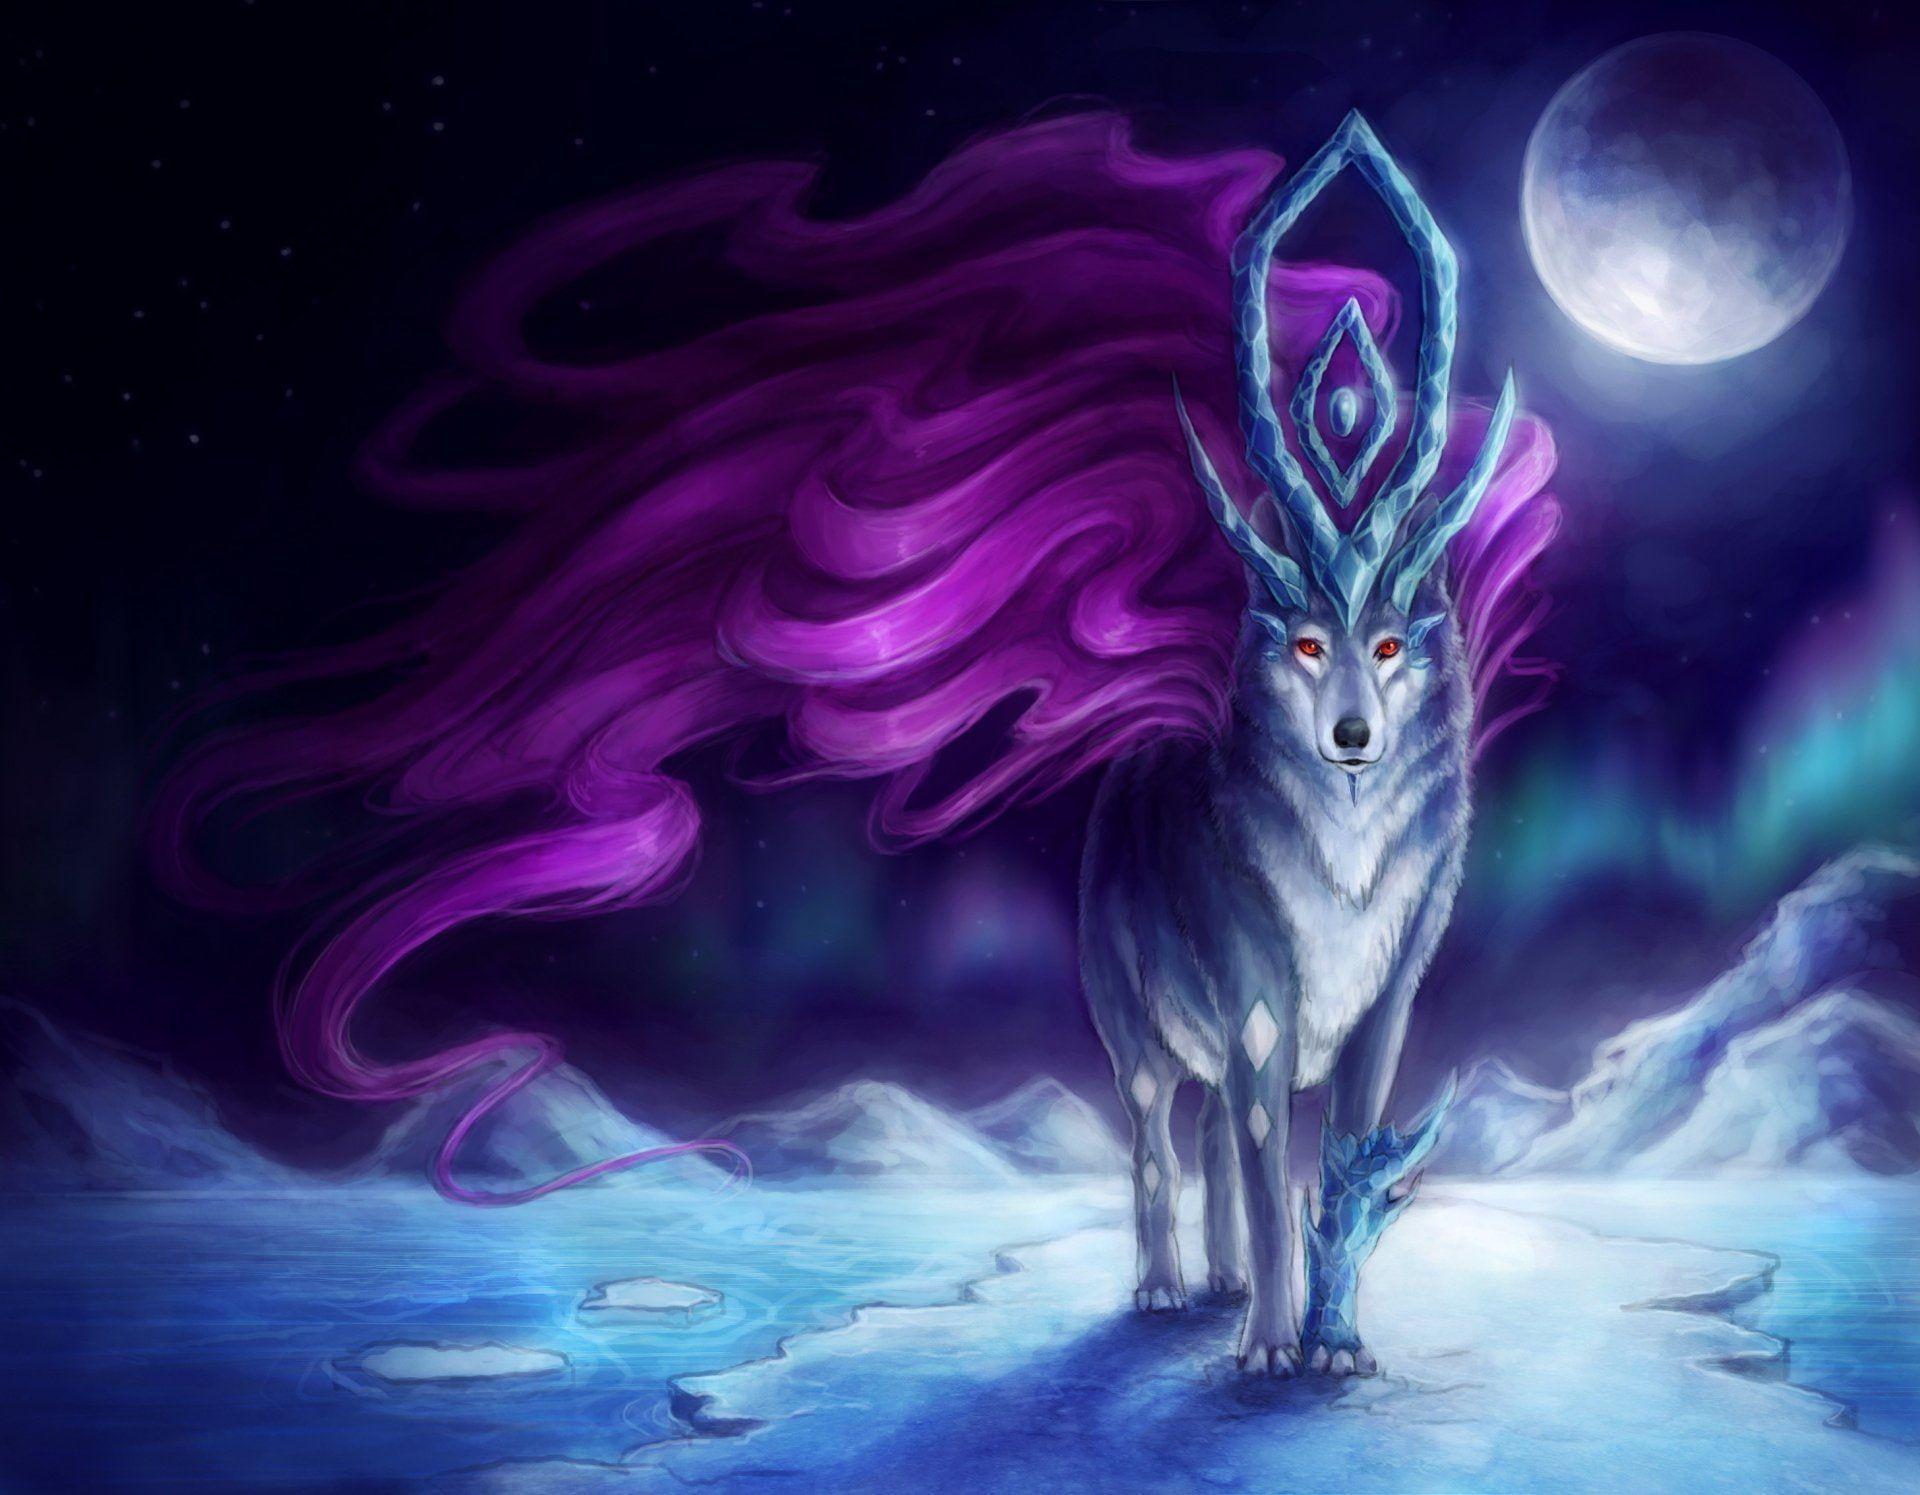 Legendary Pokémon Moon Wallpapers - Top Free Legendary ...